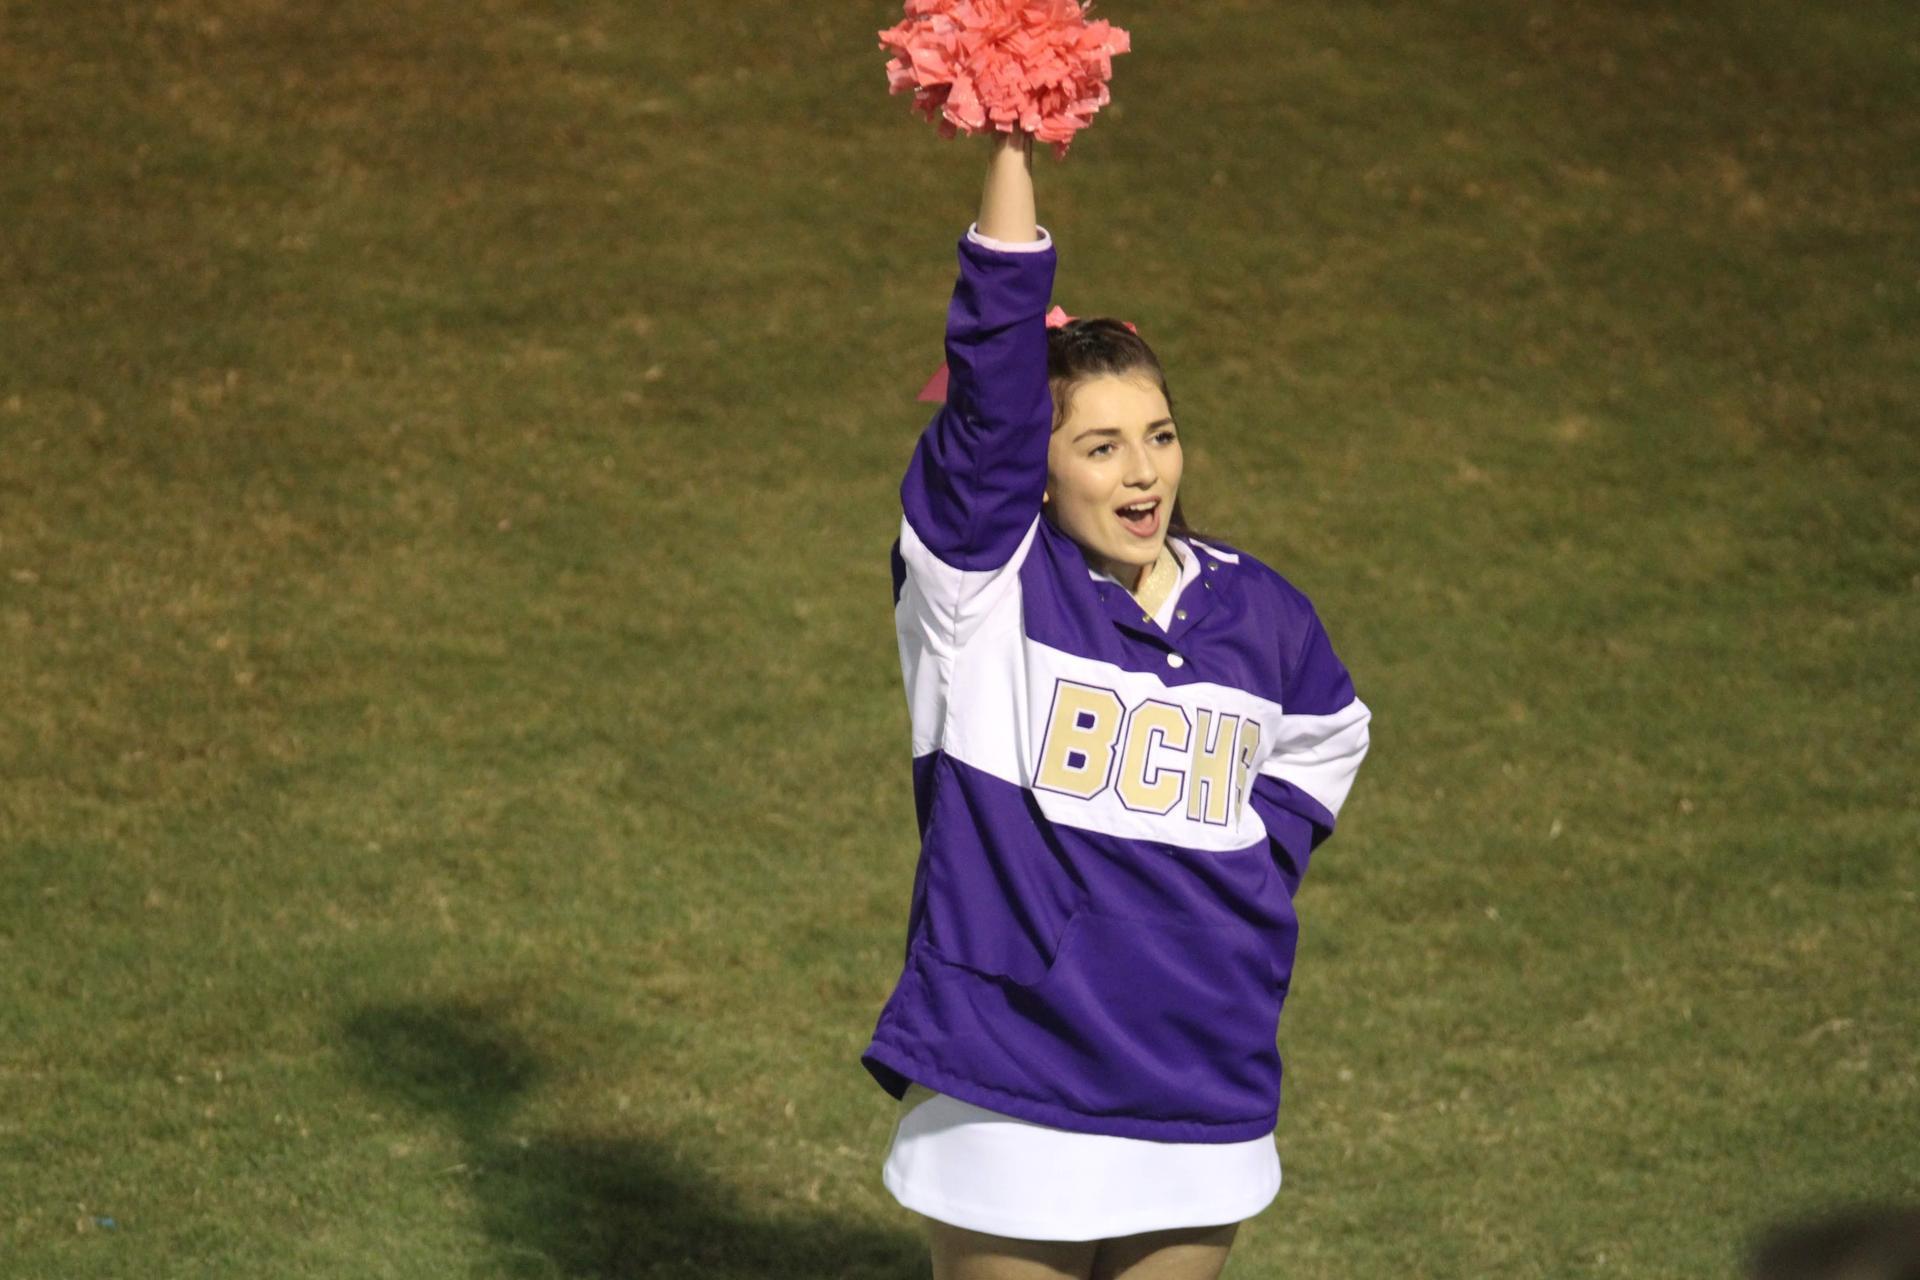 Cheer action shot